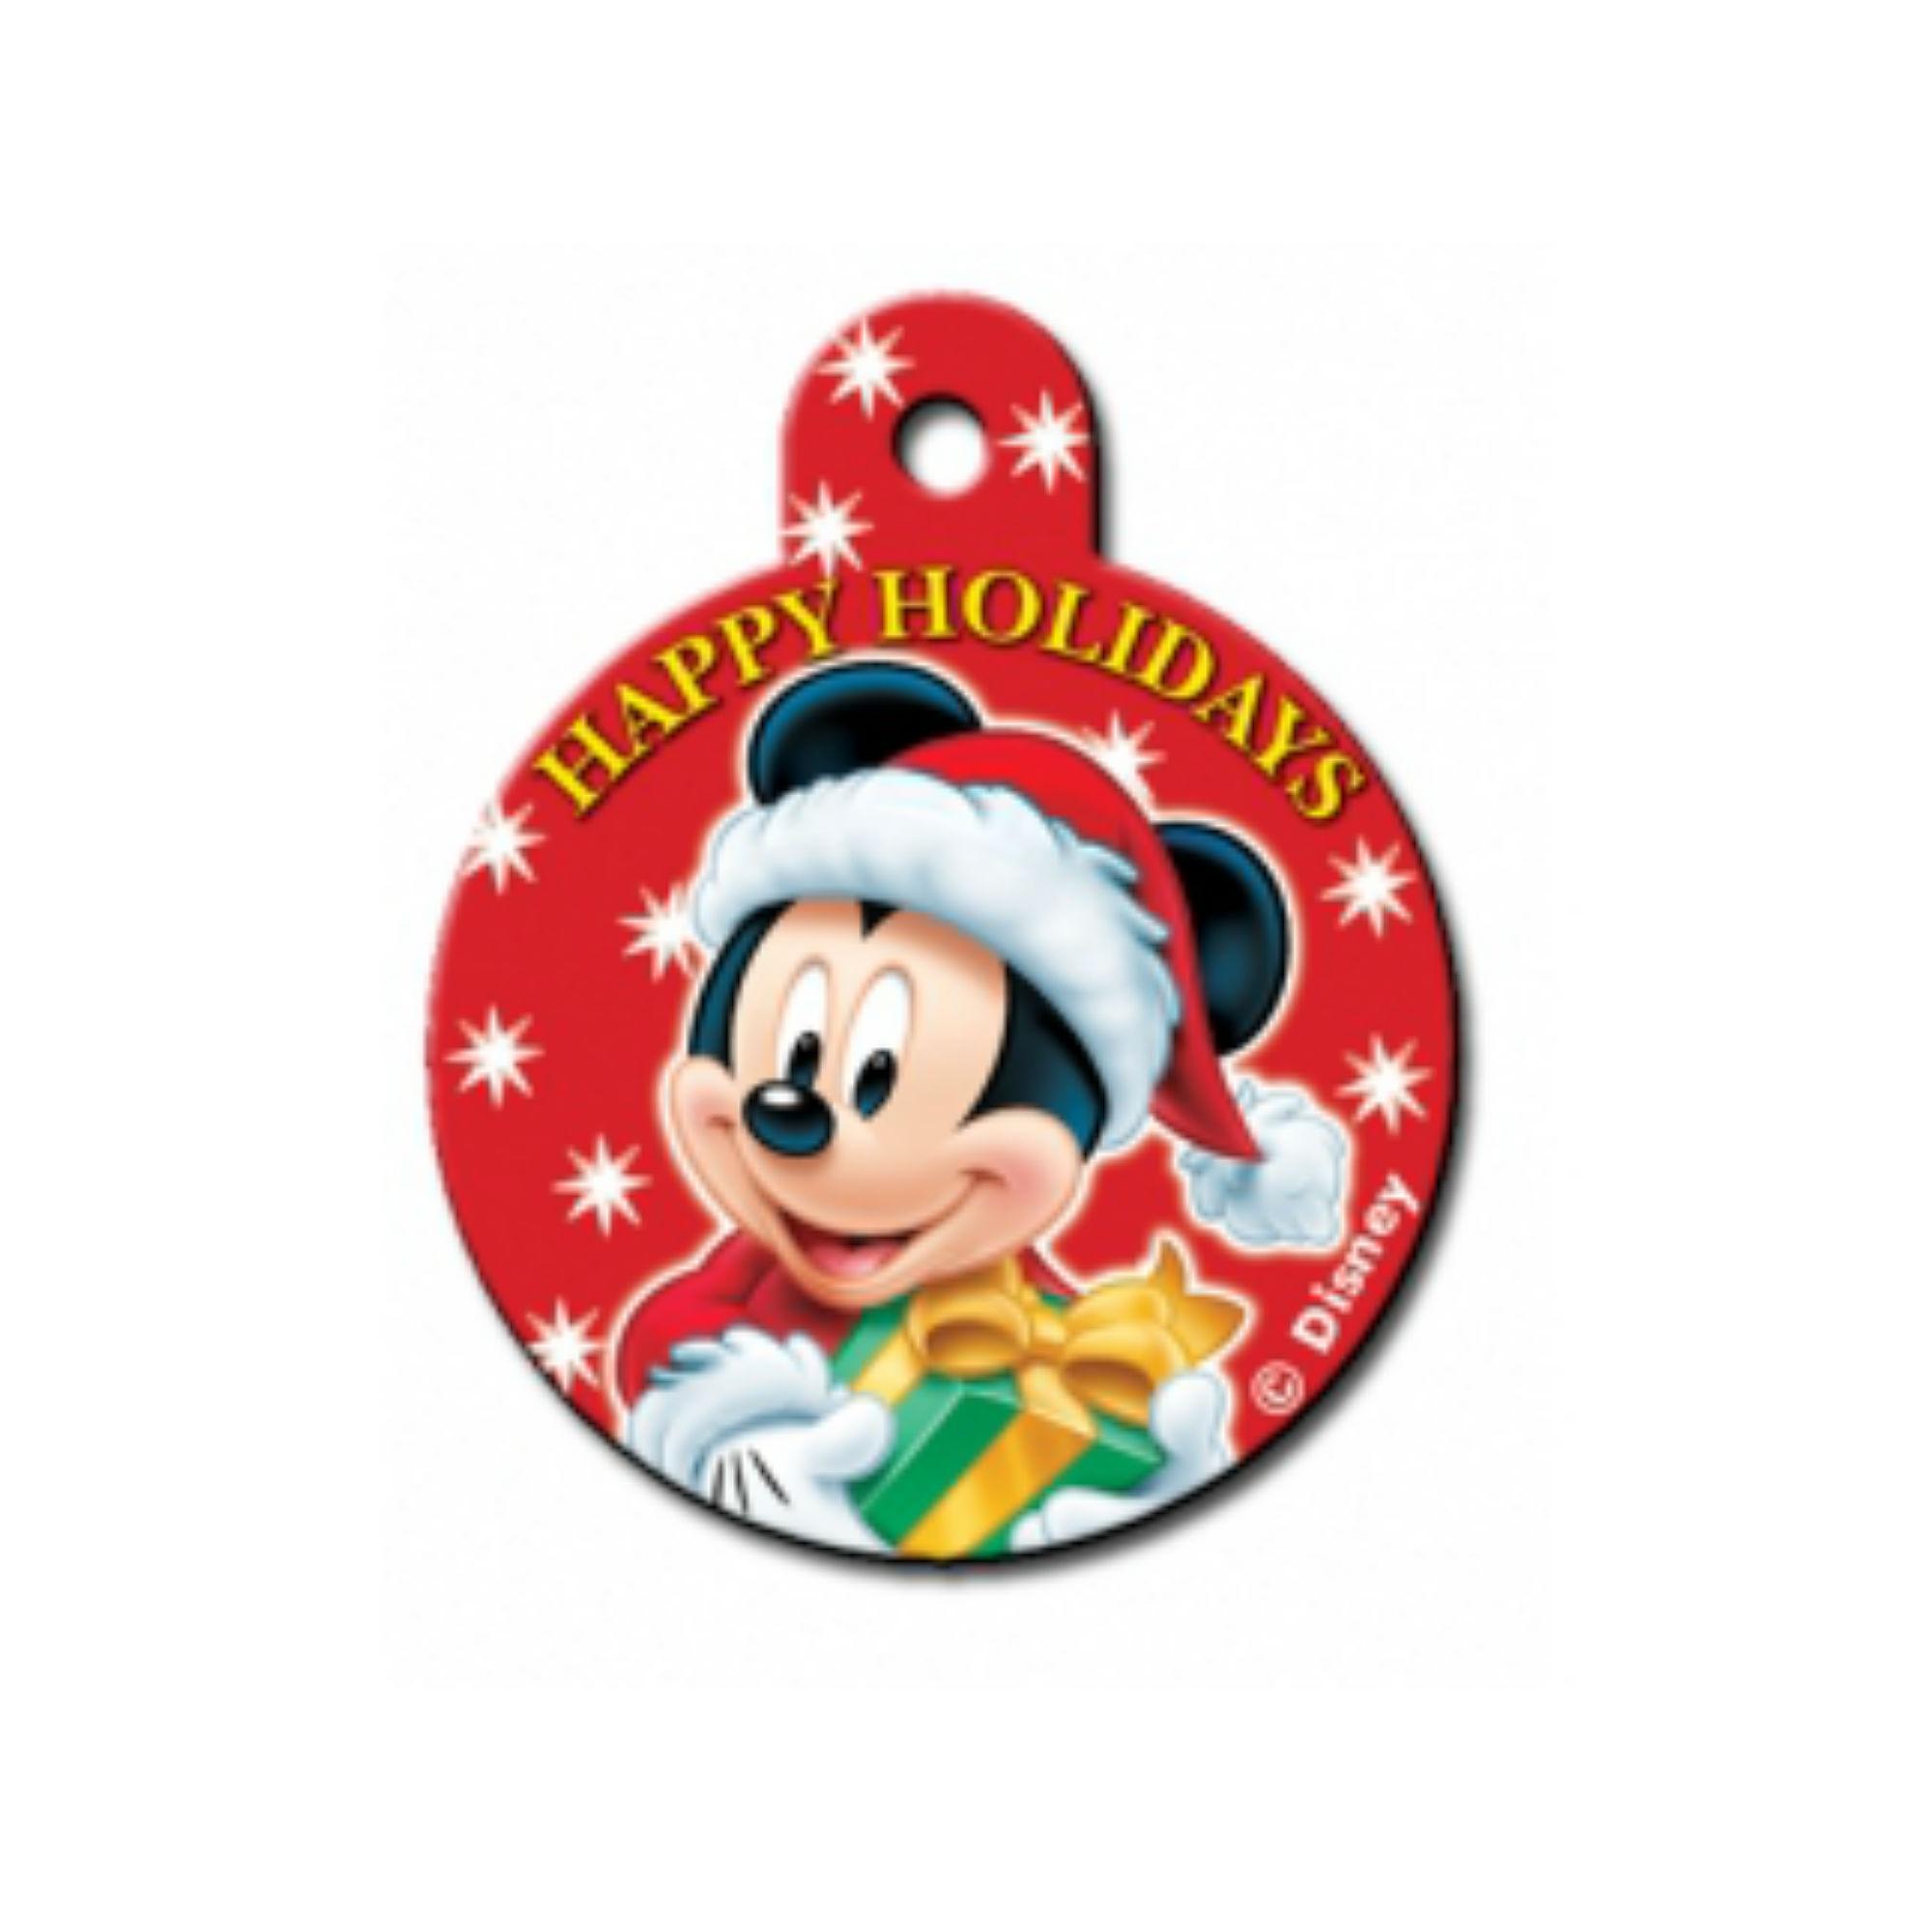 Holiday Large Circle Engravable Pet I.D. Tag - Mickey & Presents